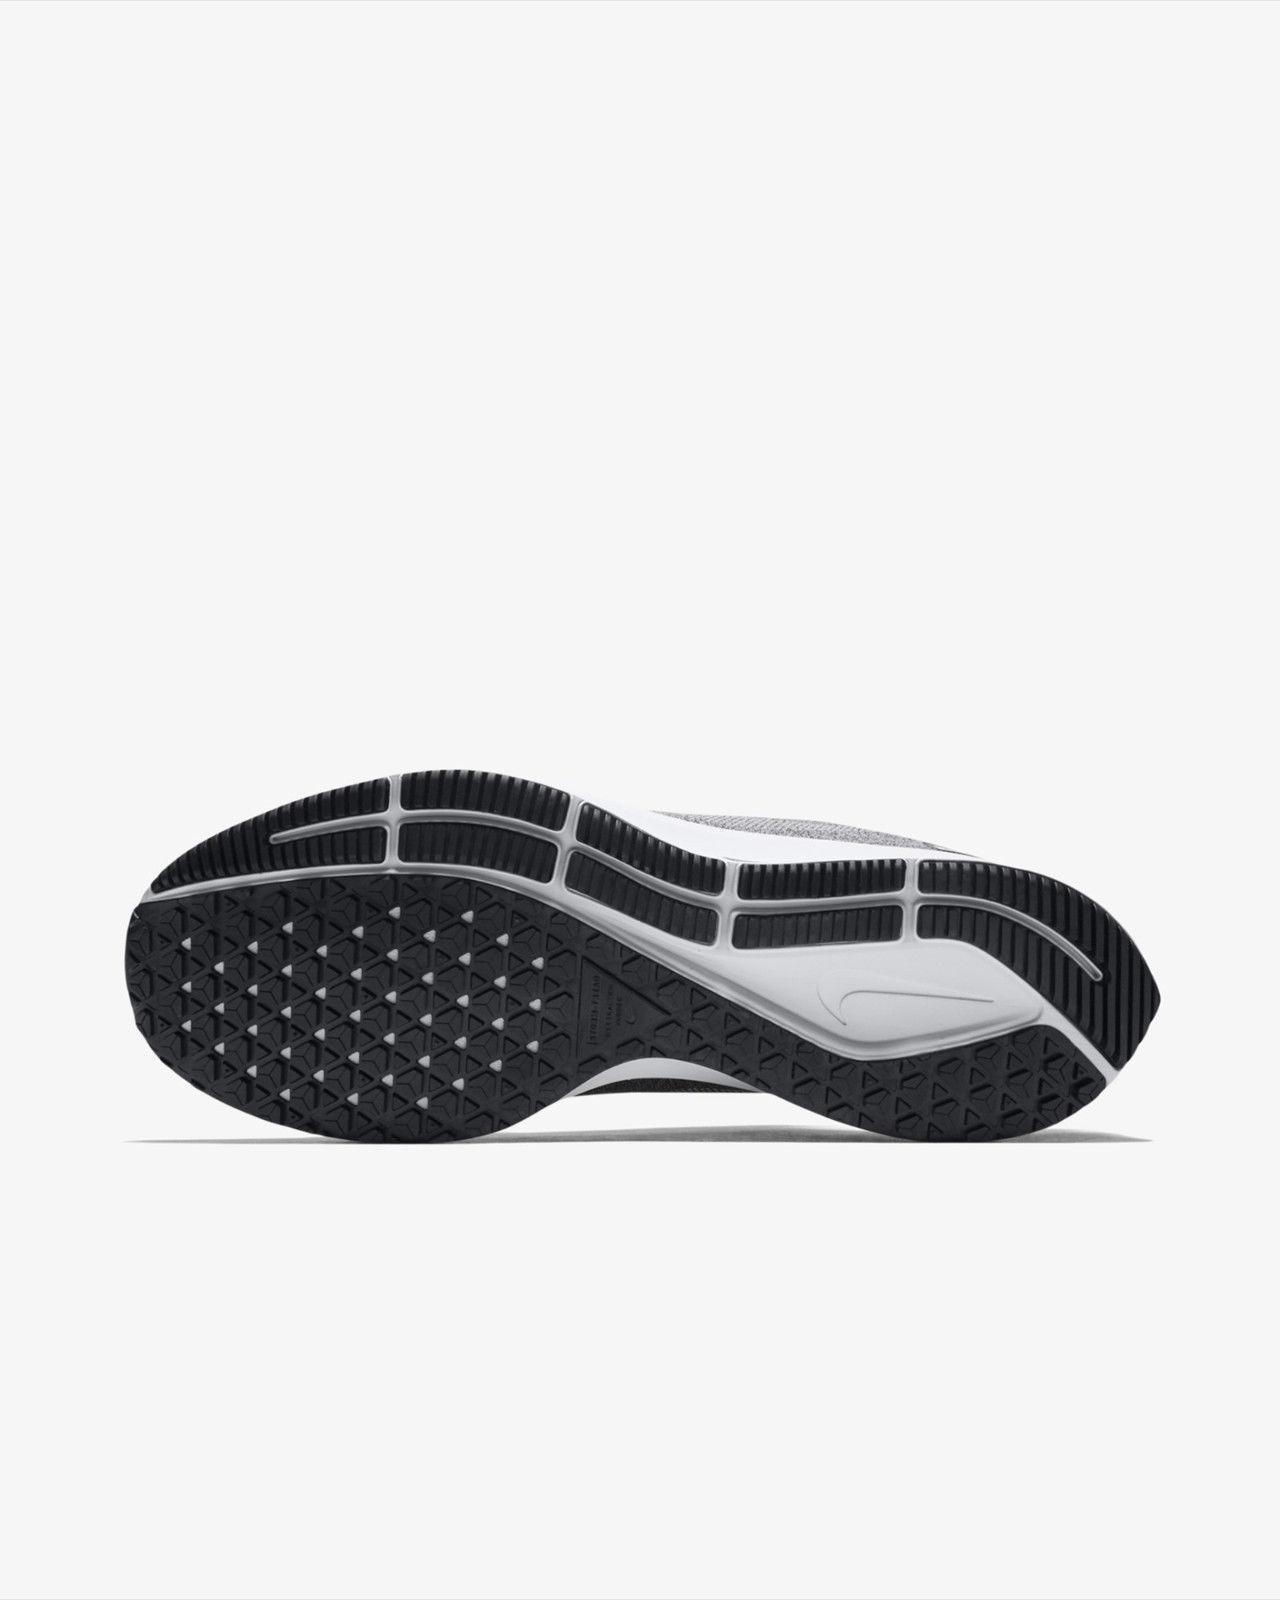 4fa5fa3334204 Nike Air Zoom Pegasus 35 Shield Water-Repellent AA1643-001 Mens Running  Shoes